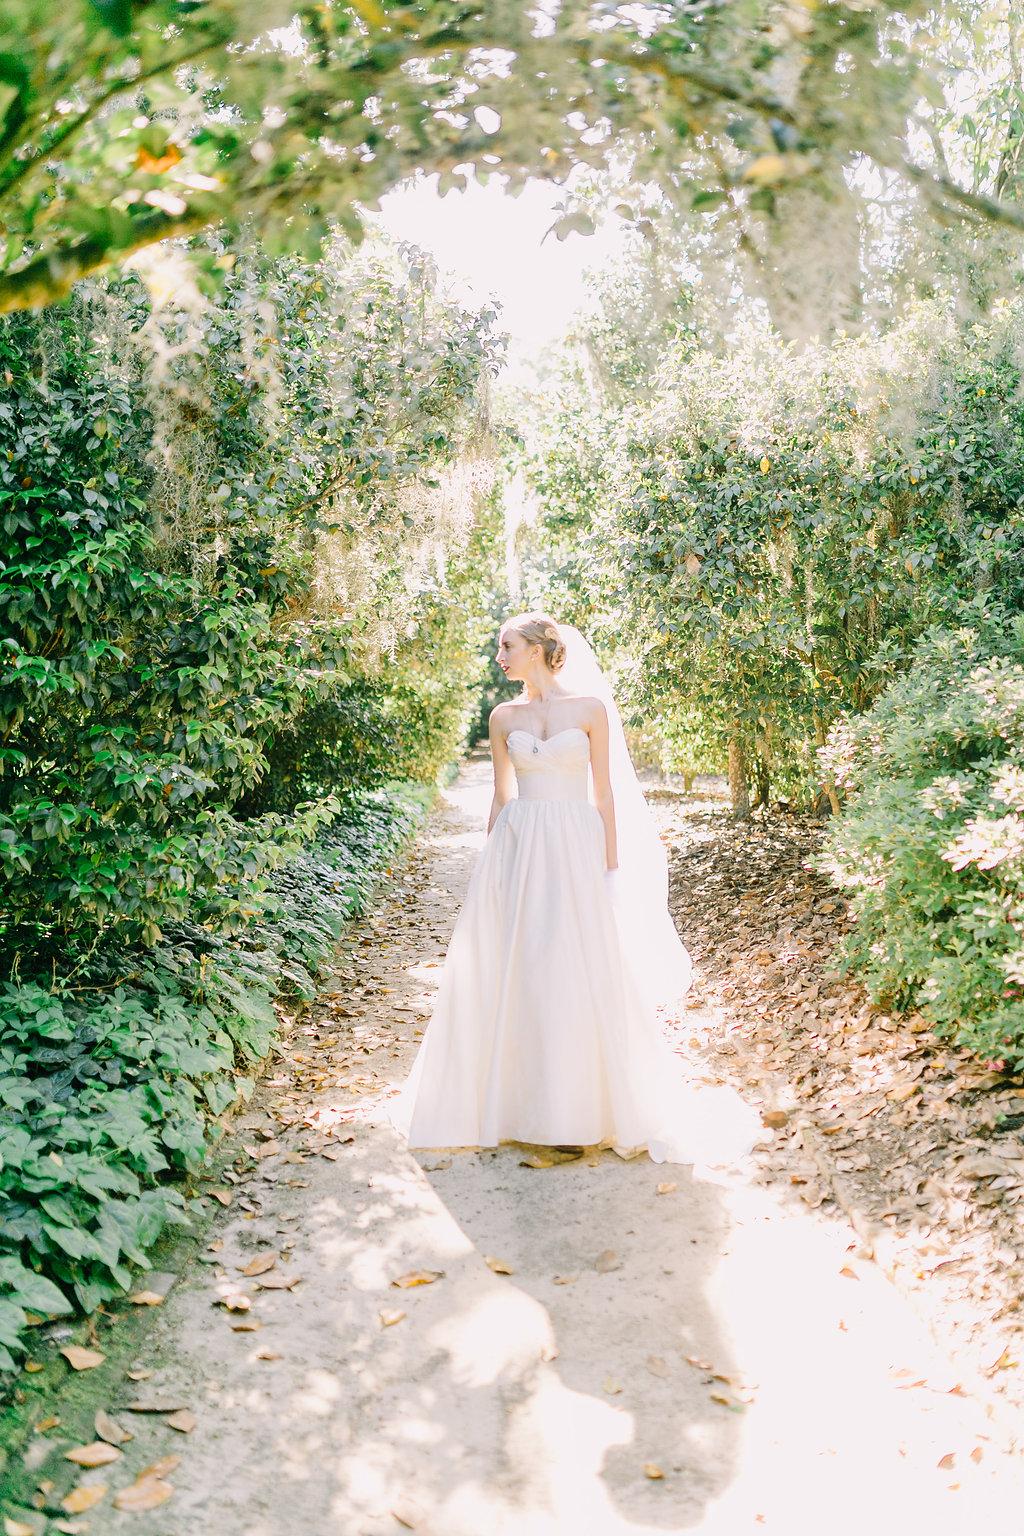 middleton-place-bridal-photos-73.jpg